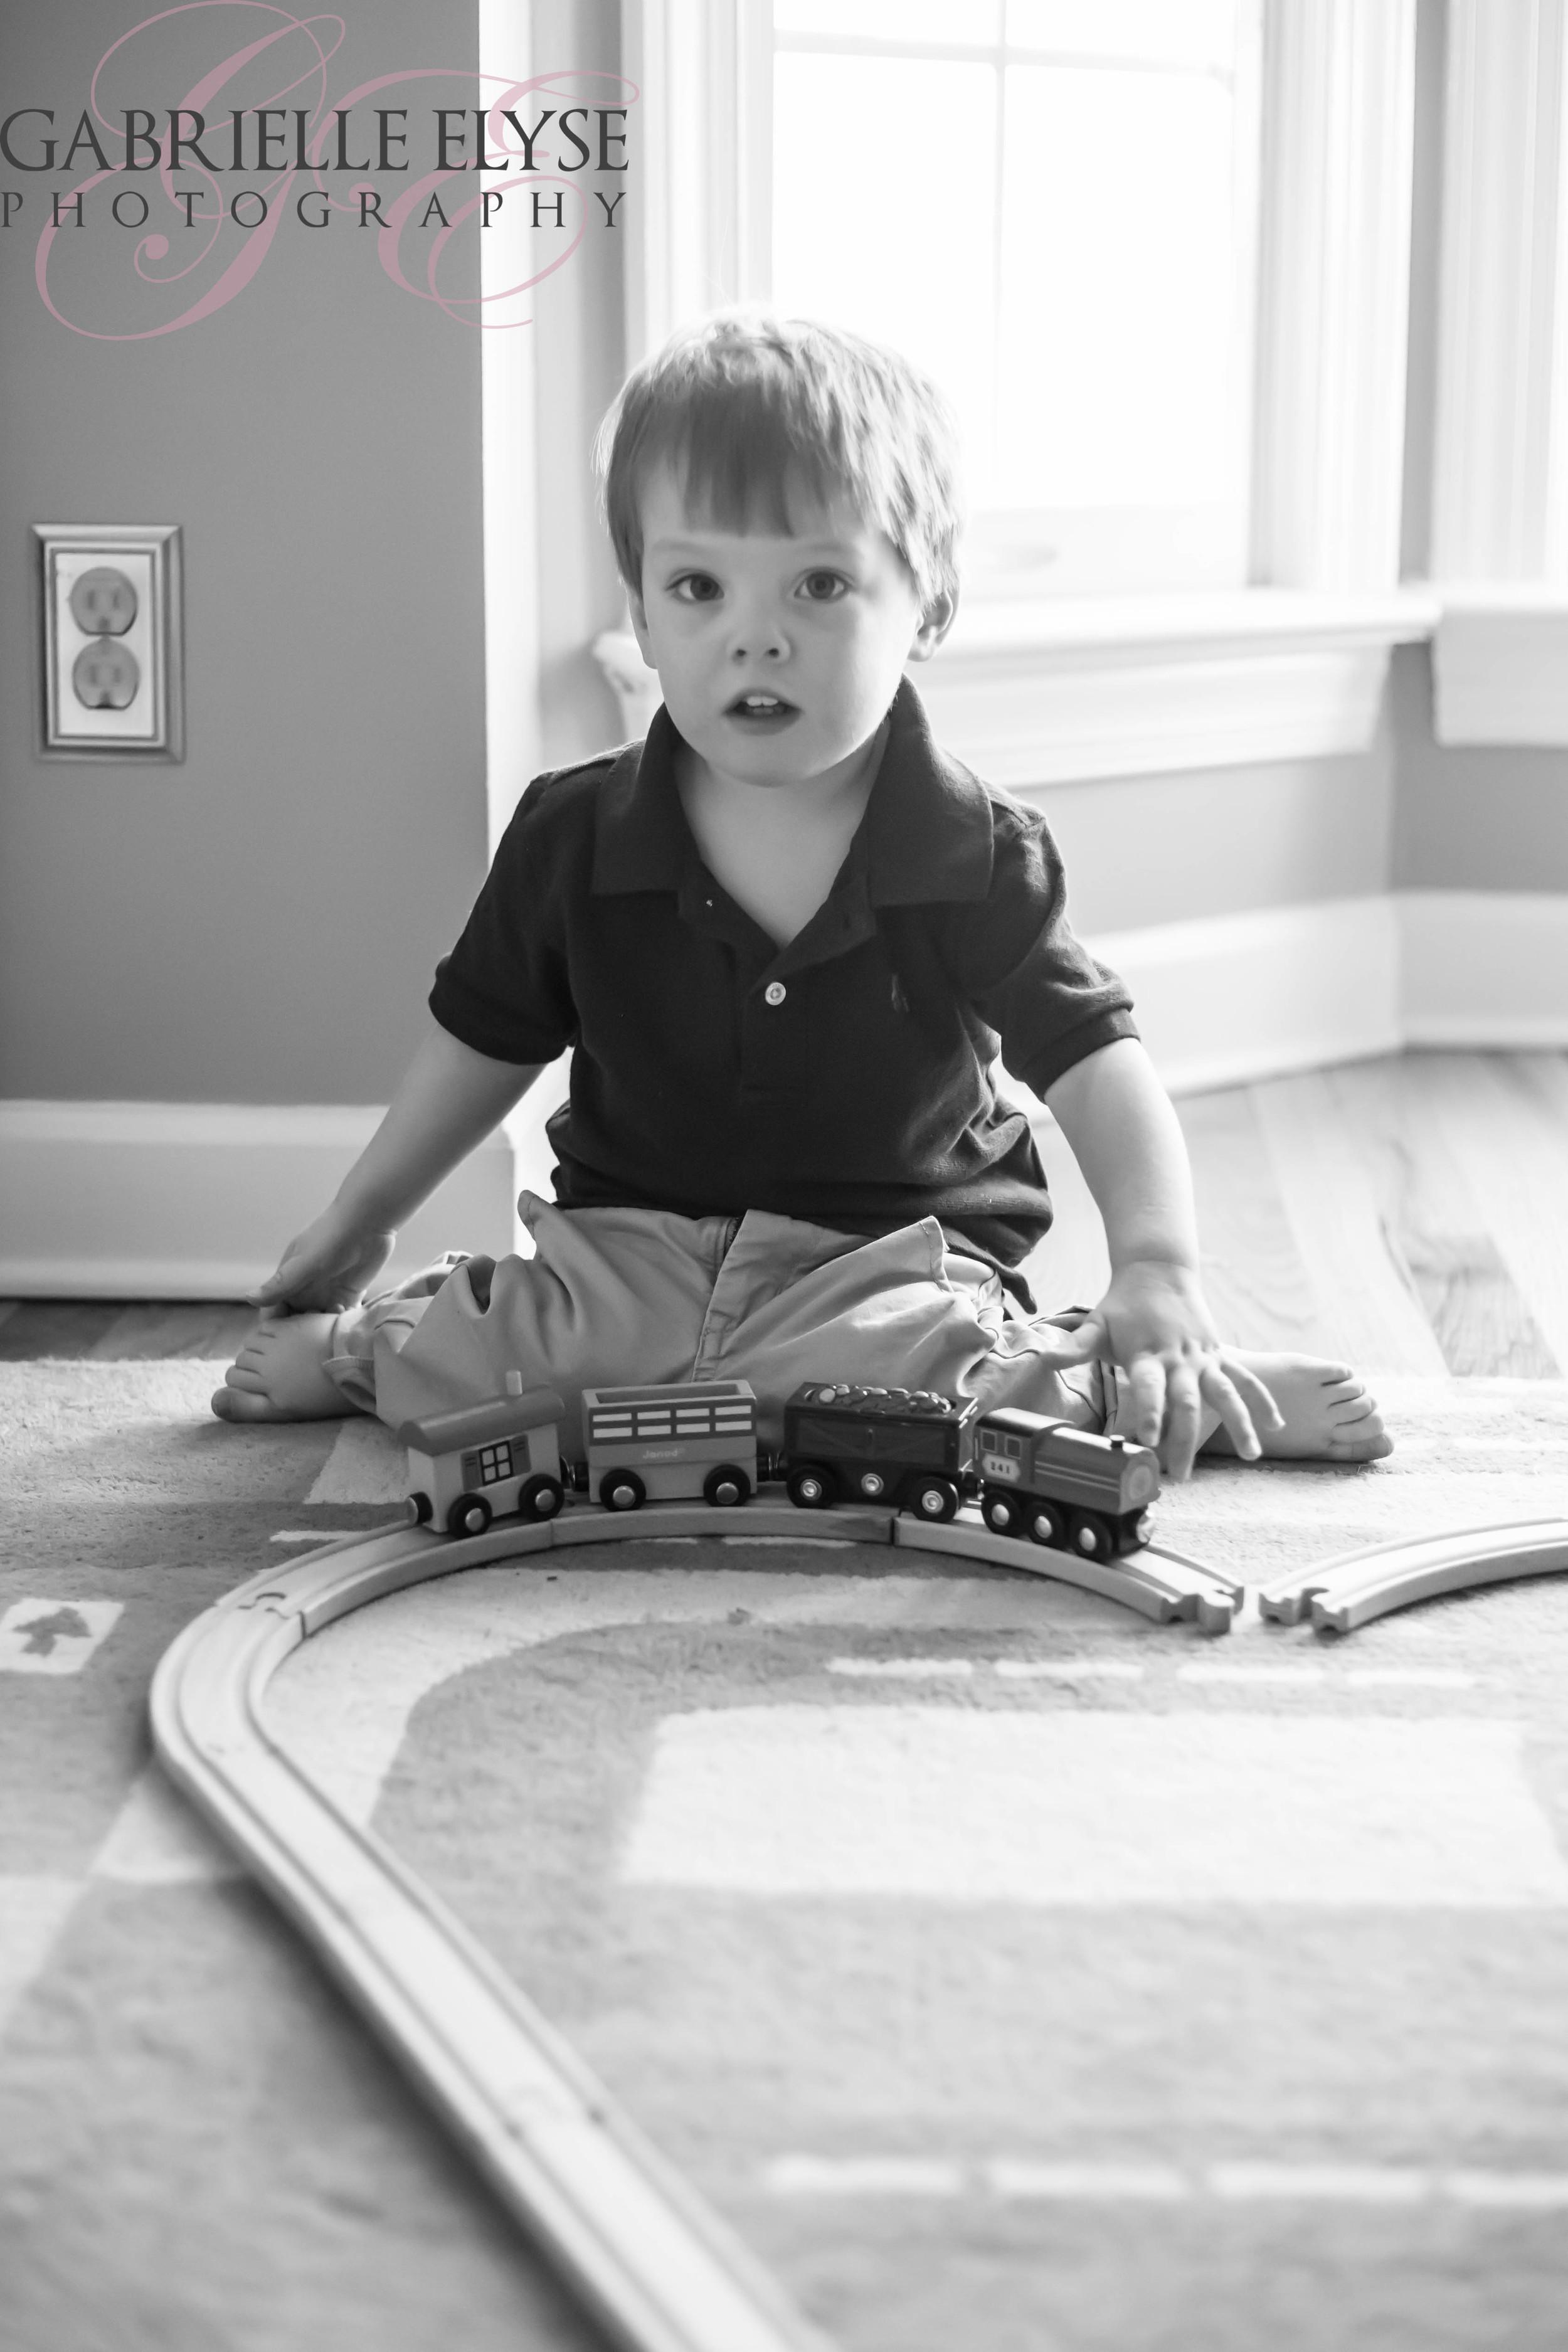 Big Brother playing with his trains- choo choo